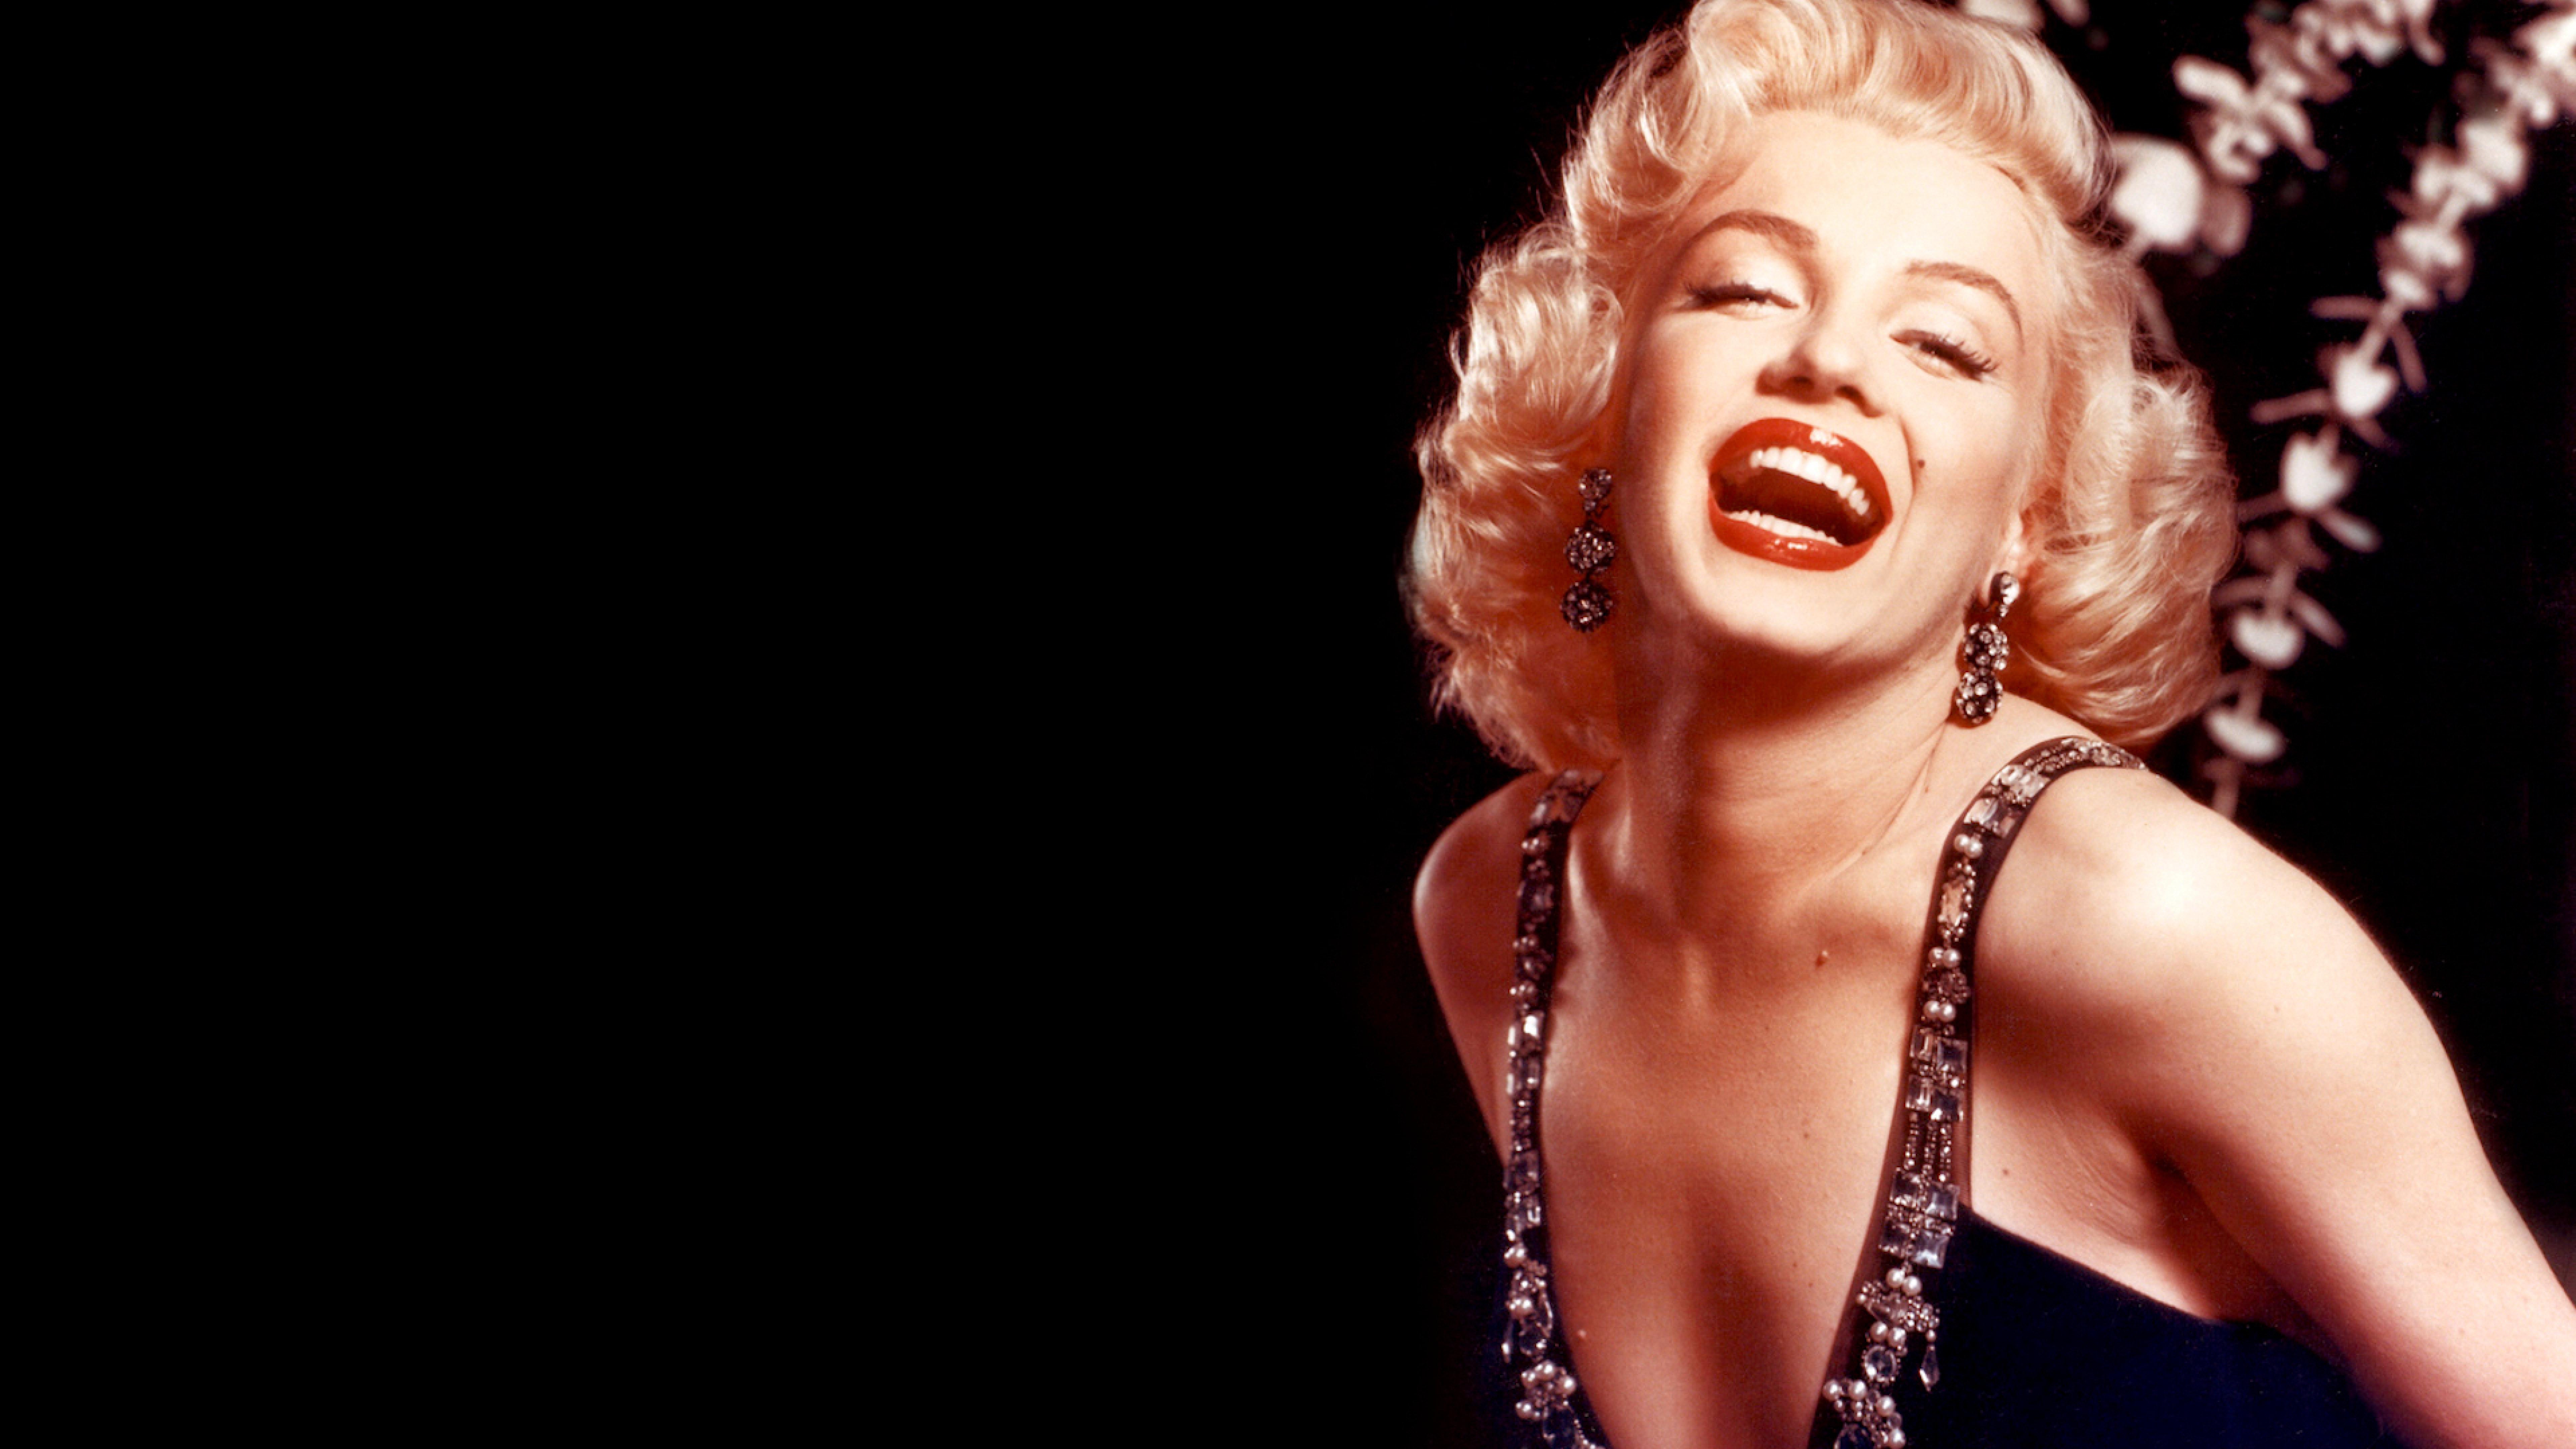 7680x4320 Marilyn Monroe Boobs Images